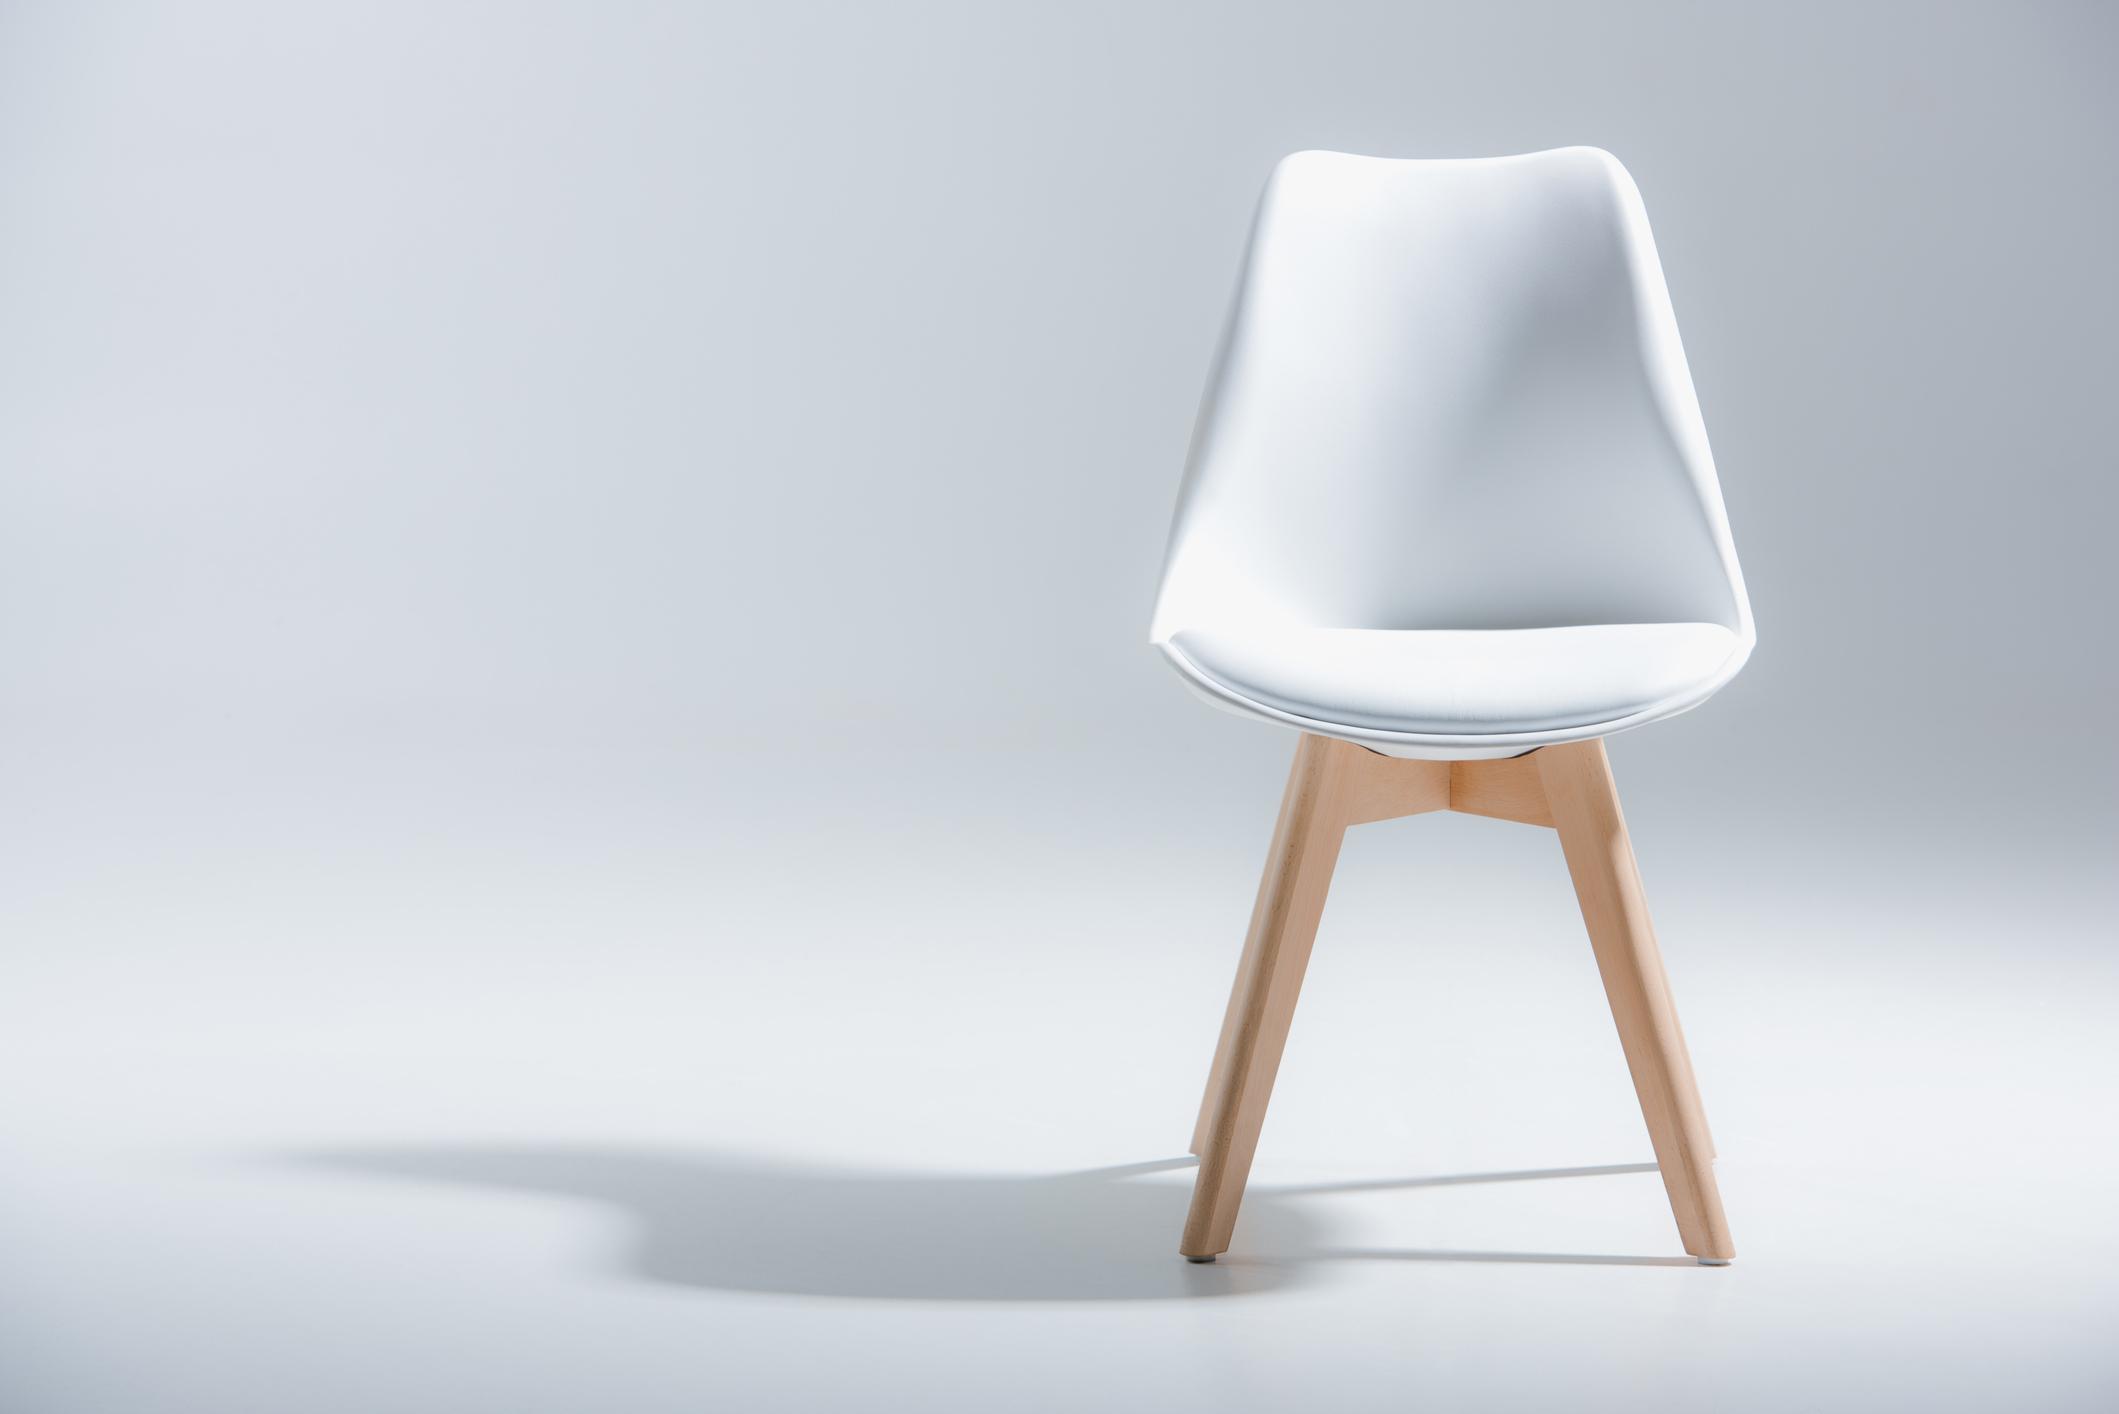 Chaises design 2020 : notre top 6 | Menzzo Blog Blog